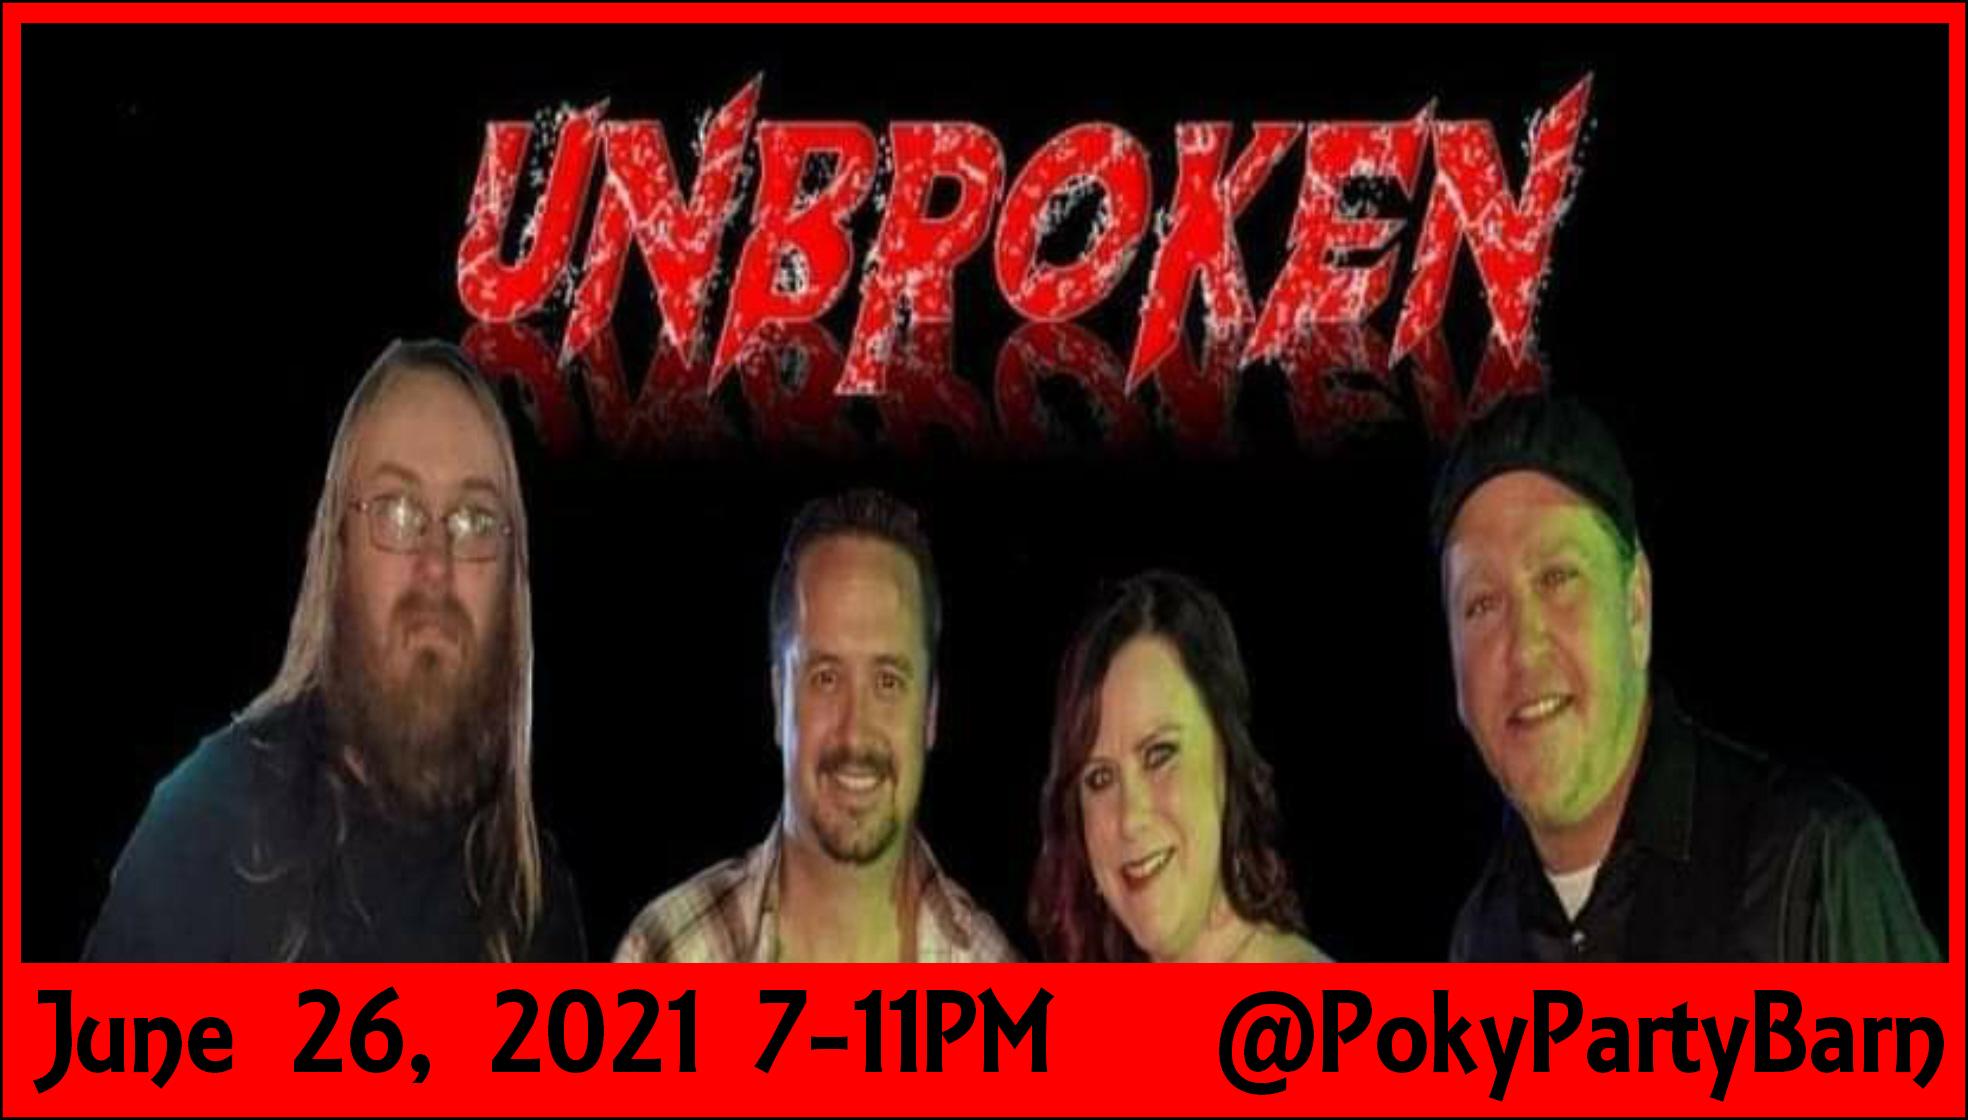 Live Music by Unbroken